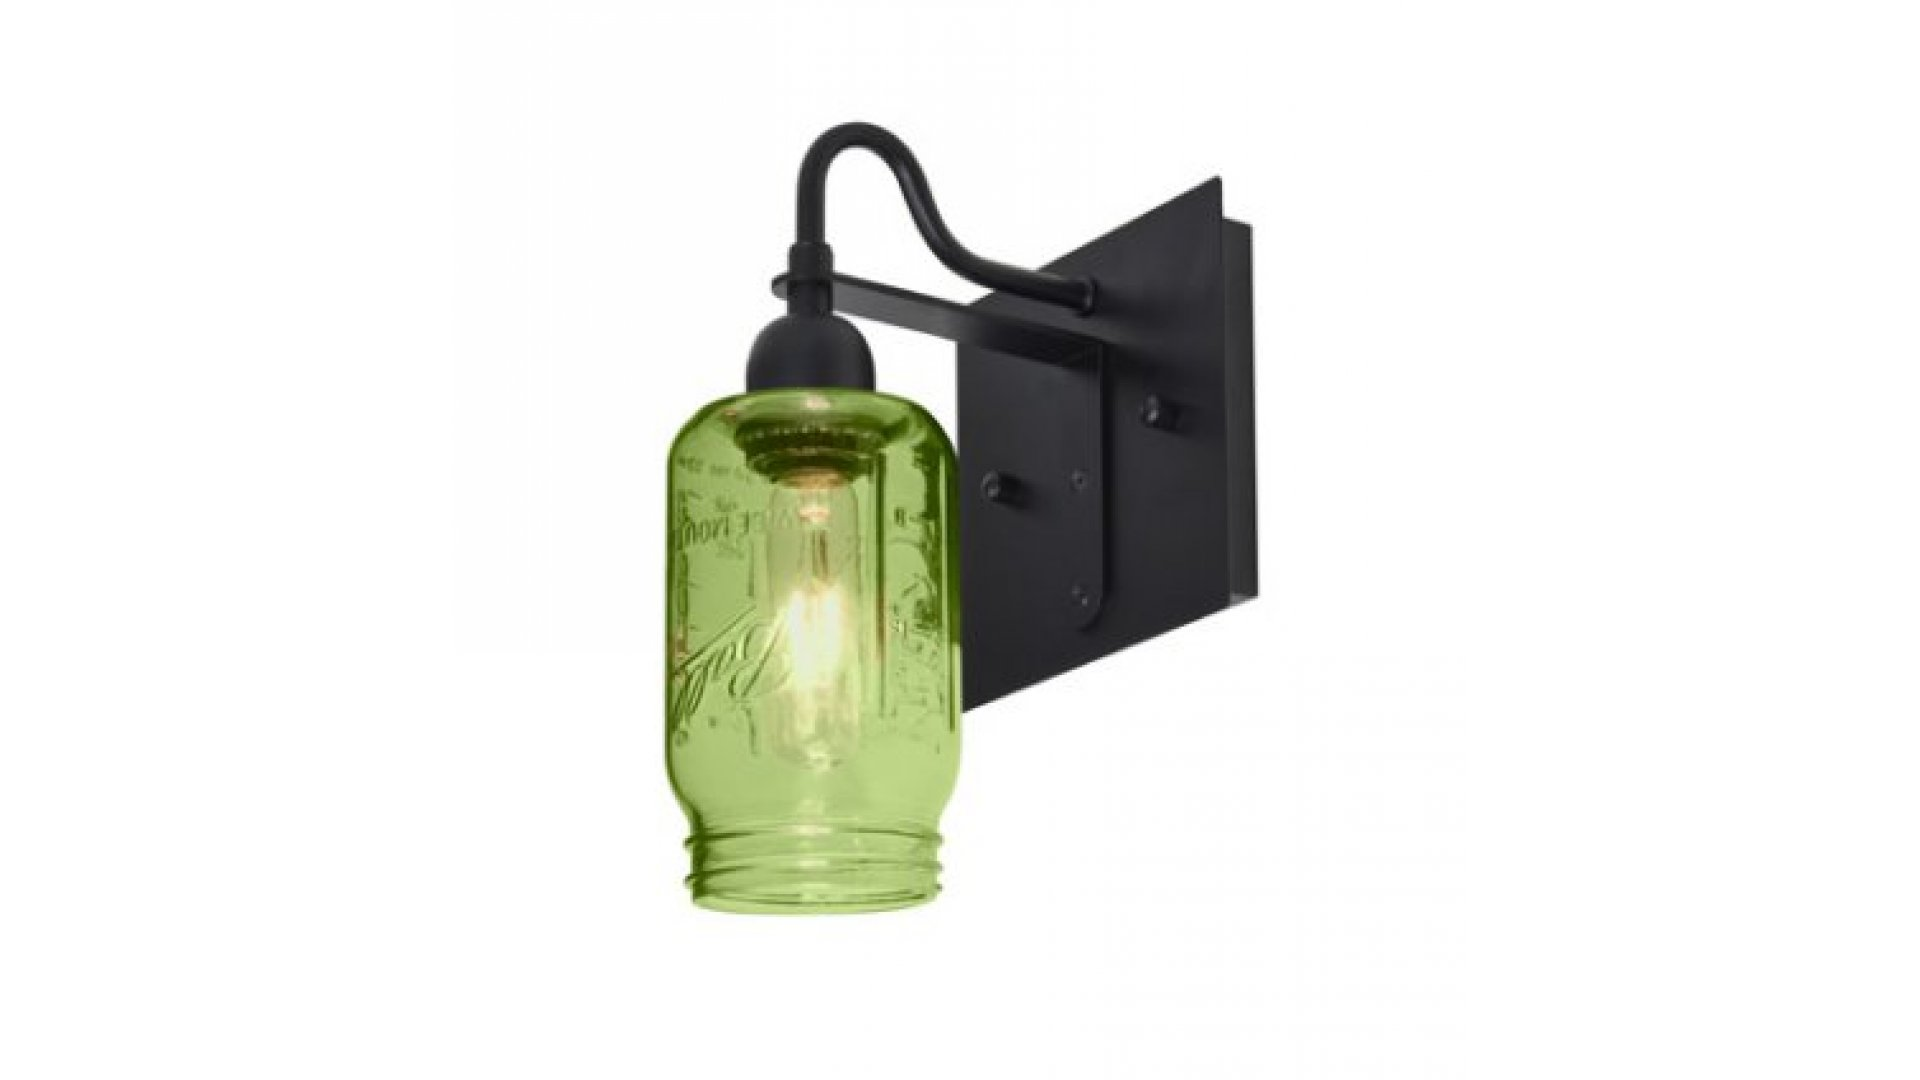 Besa Lighting 1wg Milo4wf Bk Milo 4 Series Wall Sconce Light Fixture Black Green Gl Finish